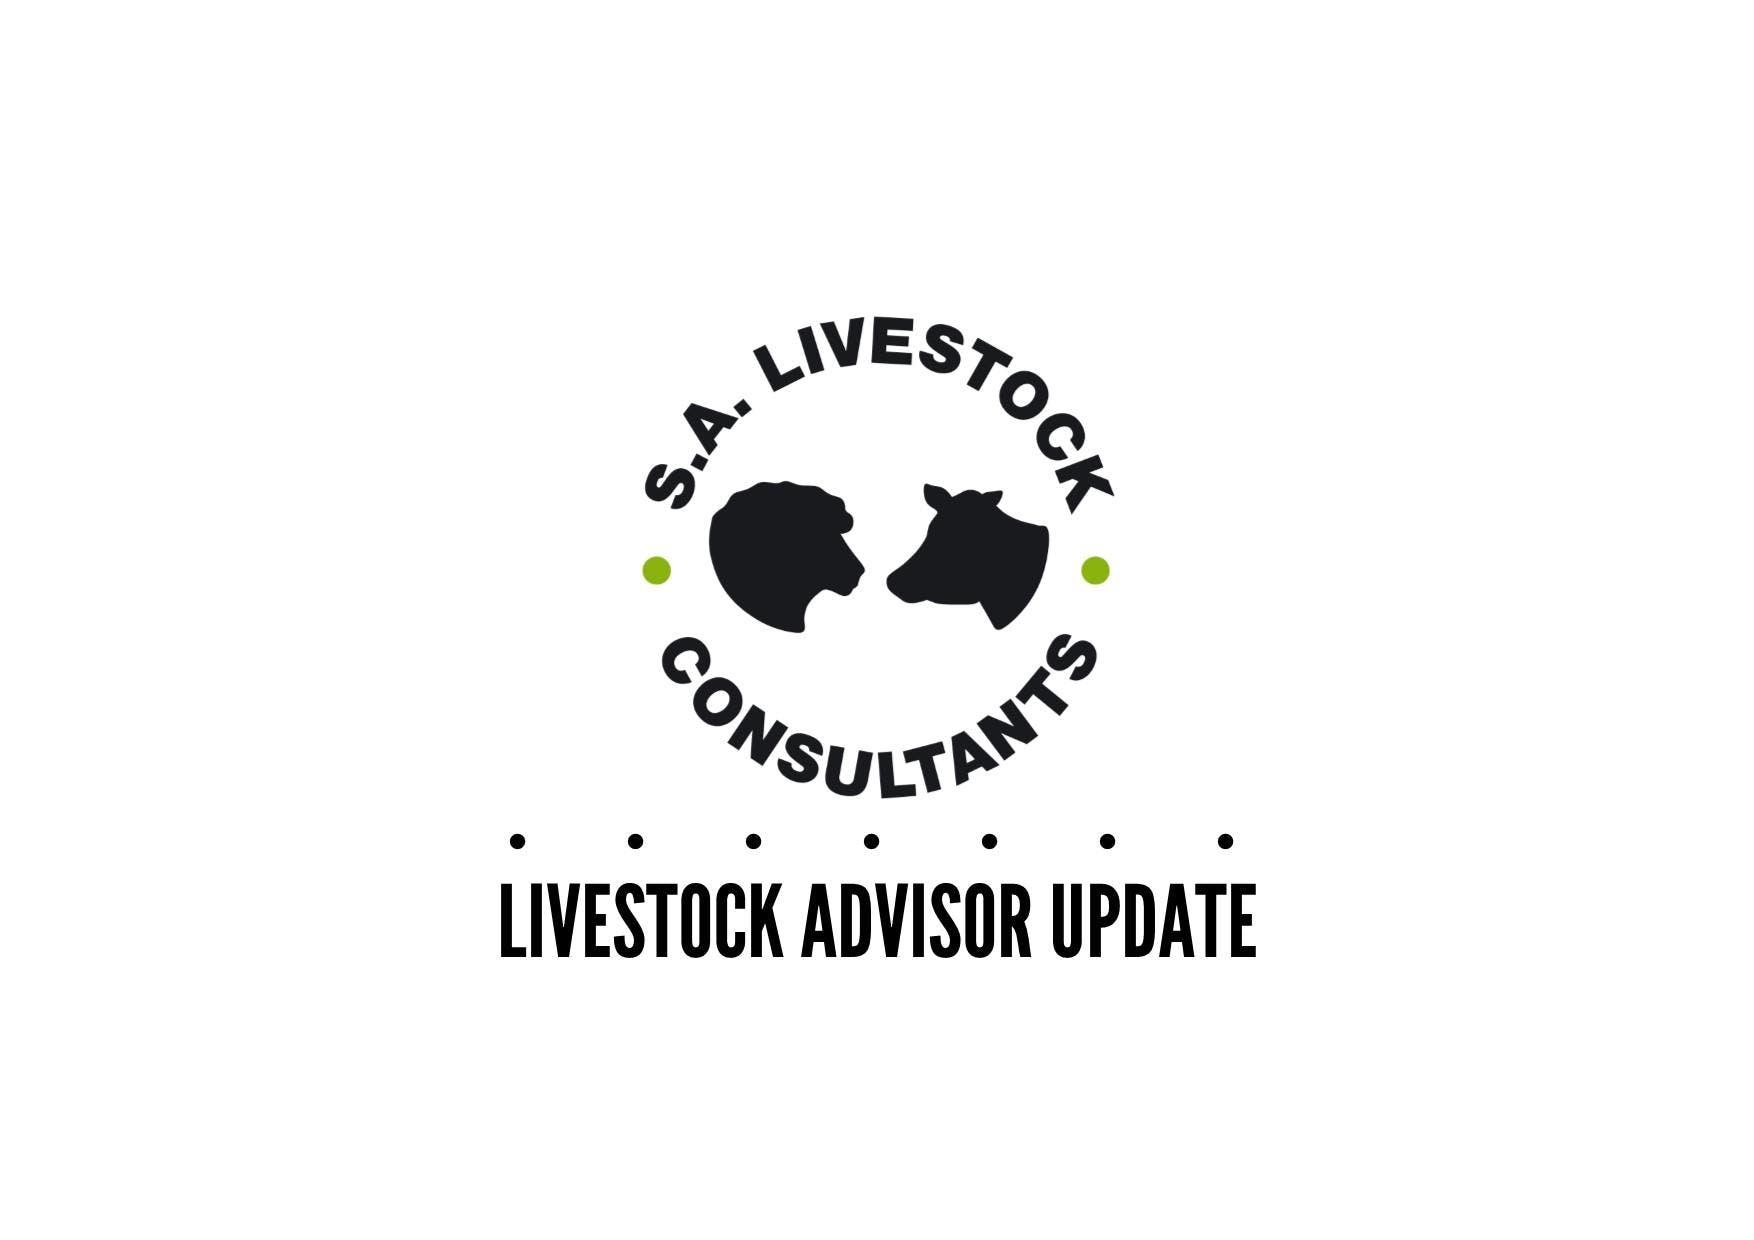 Livestock Advisor Update